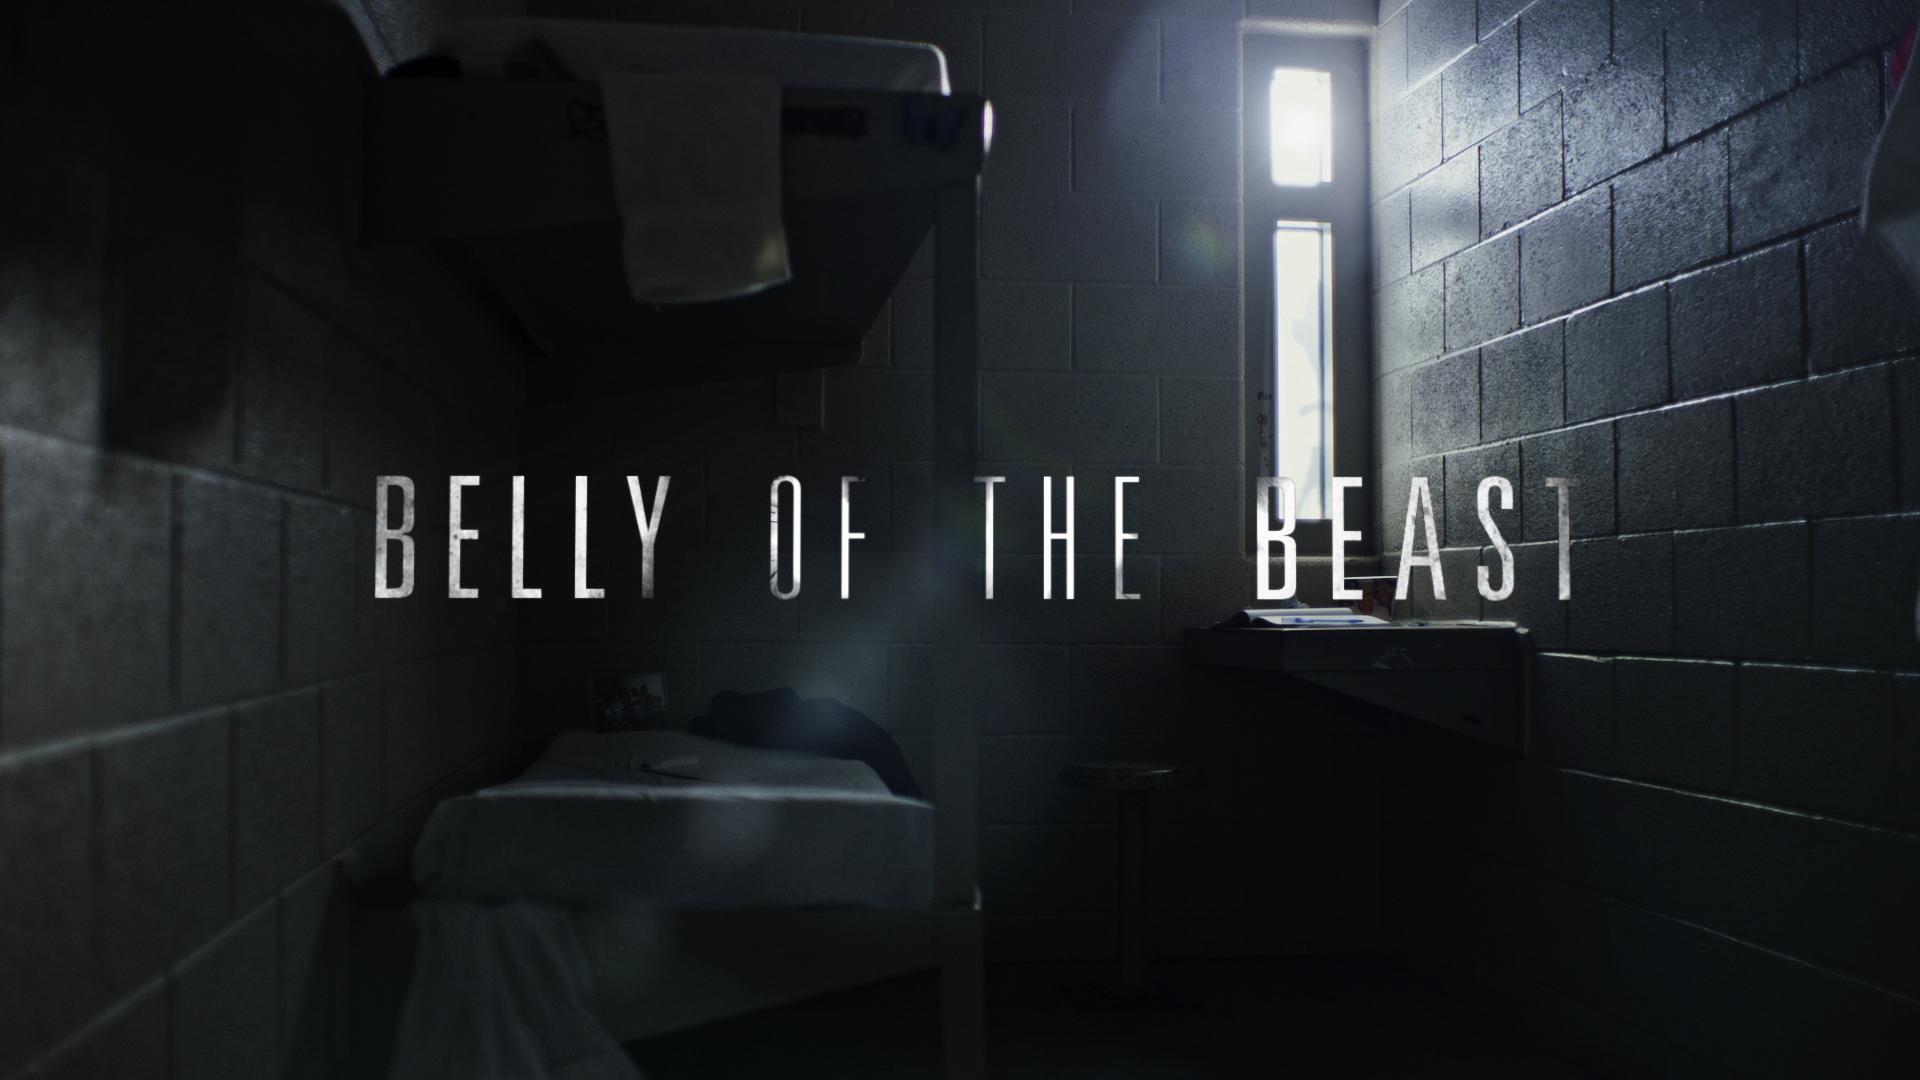 BELLY OF THE BEAST Director, Erika Cohn, Talks Eugenics & The Sterilization of Women Prisoners on Tom Needham's SOUNDS OF FILM